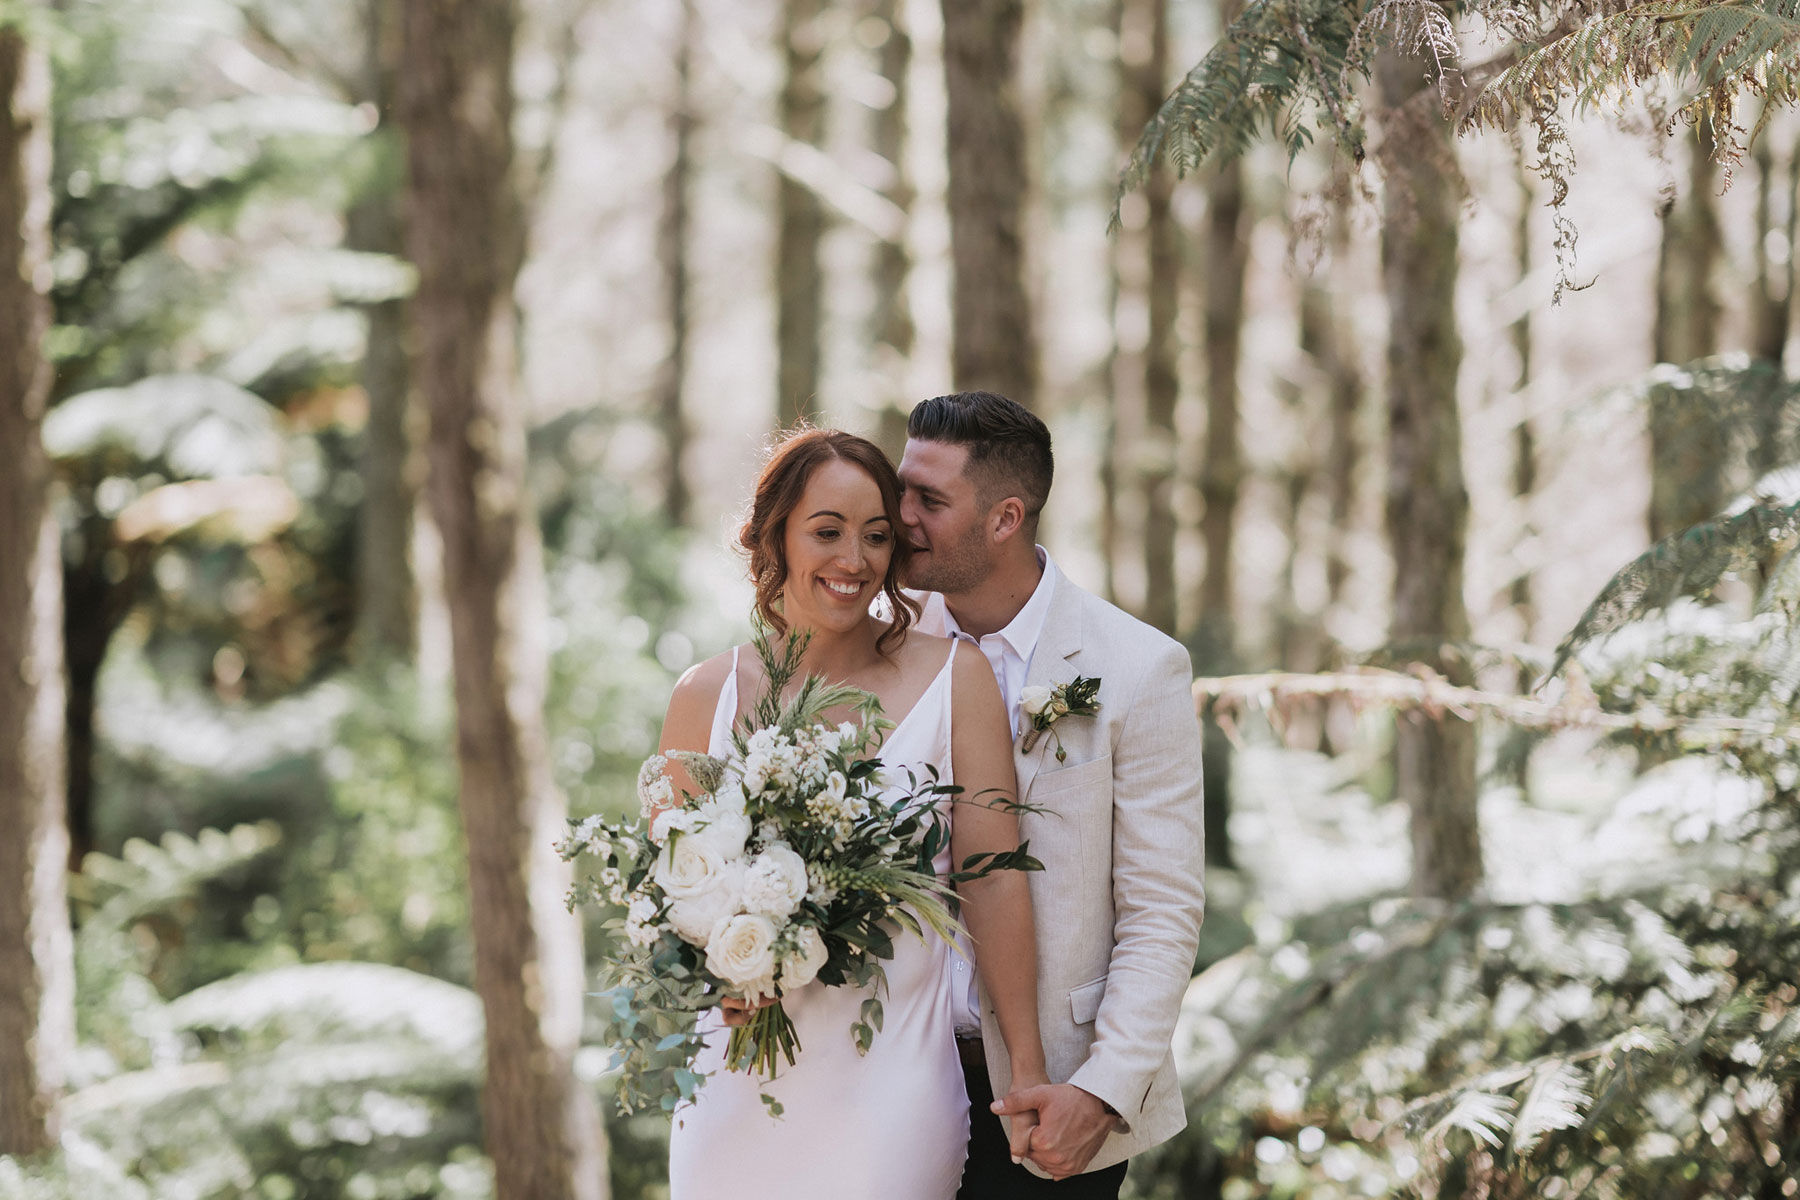 newfound-j-n-orua-beach-house-coromandel-wedding-photographers-253